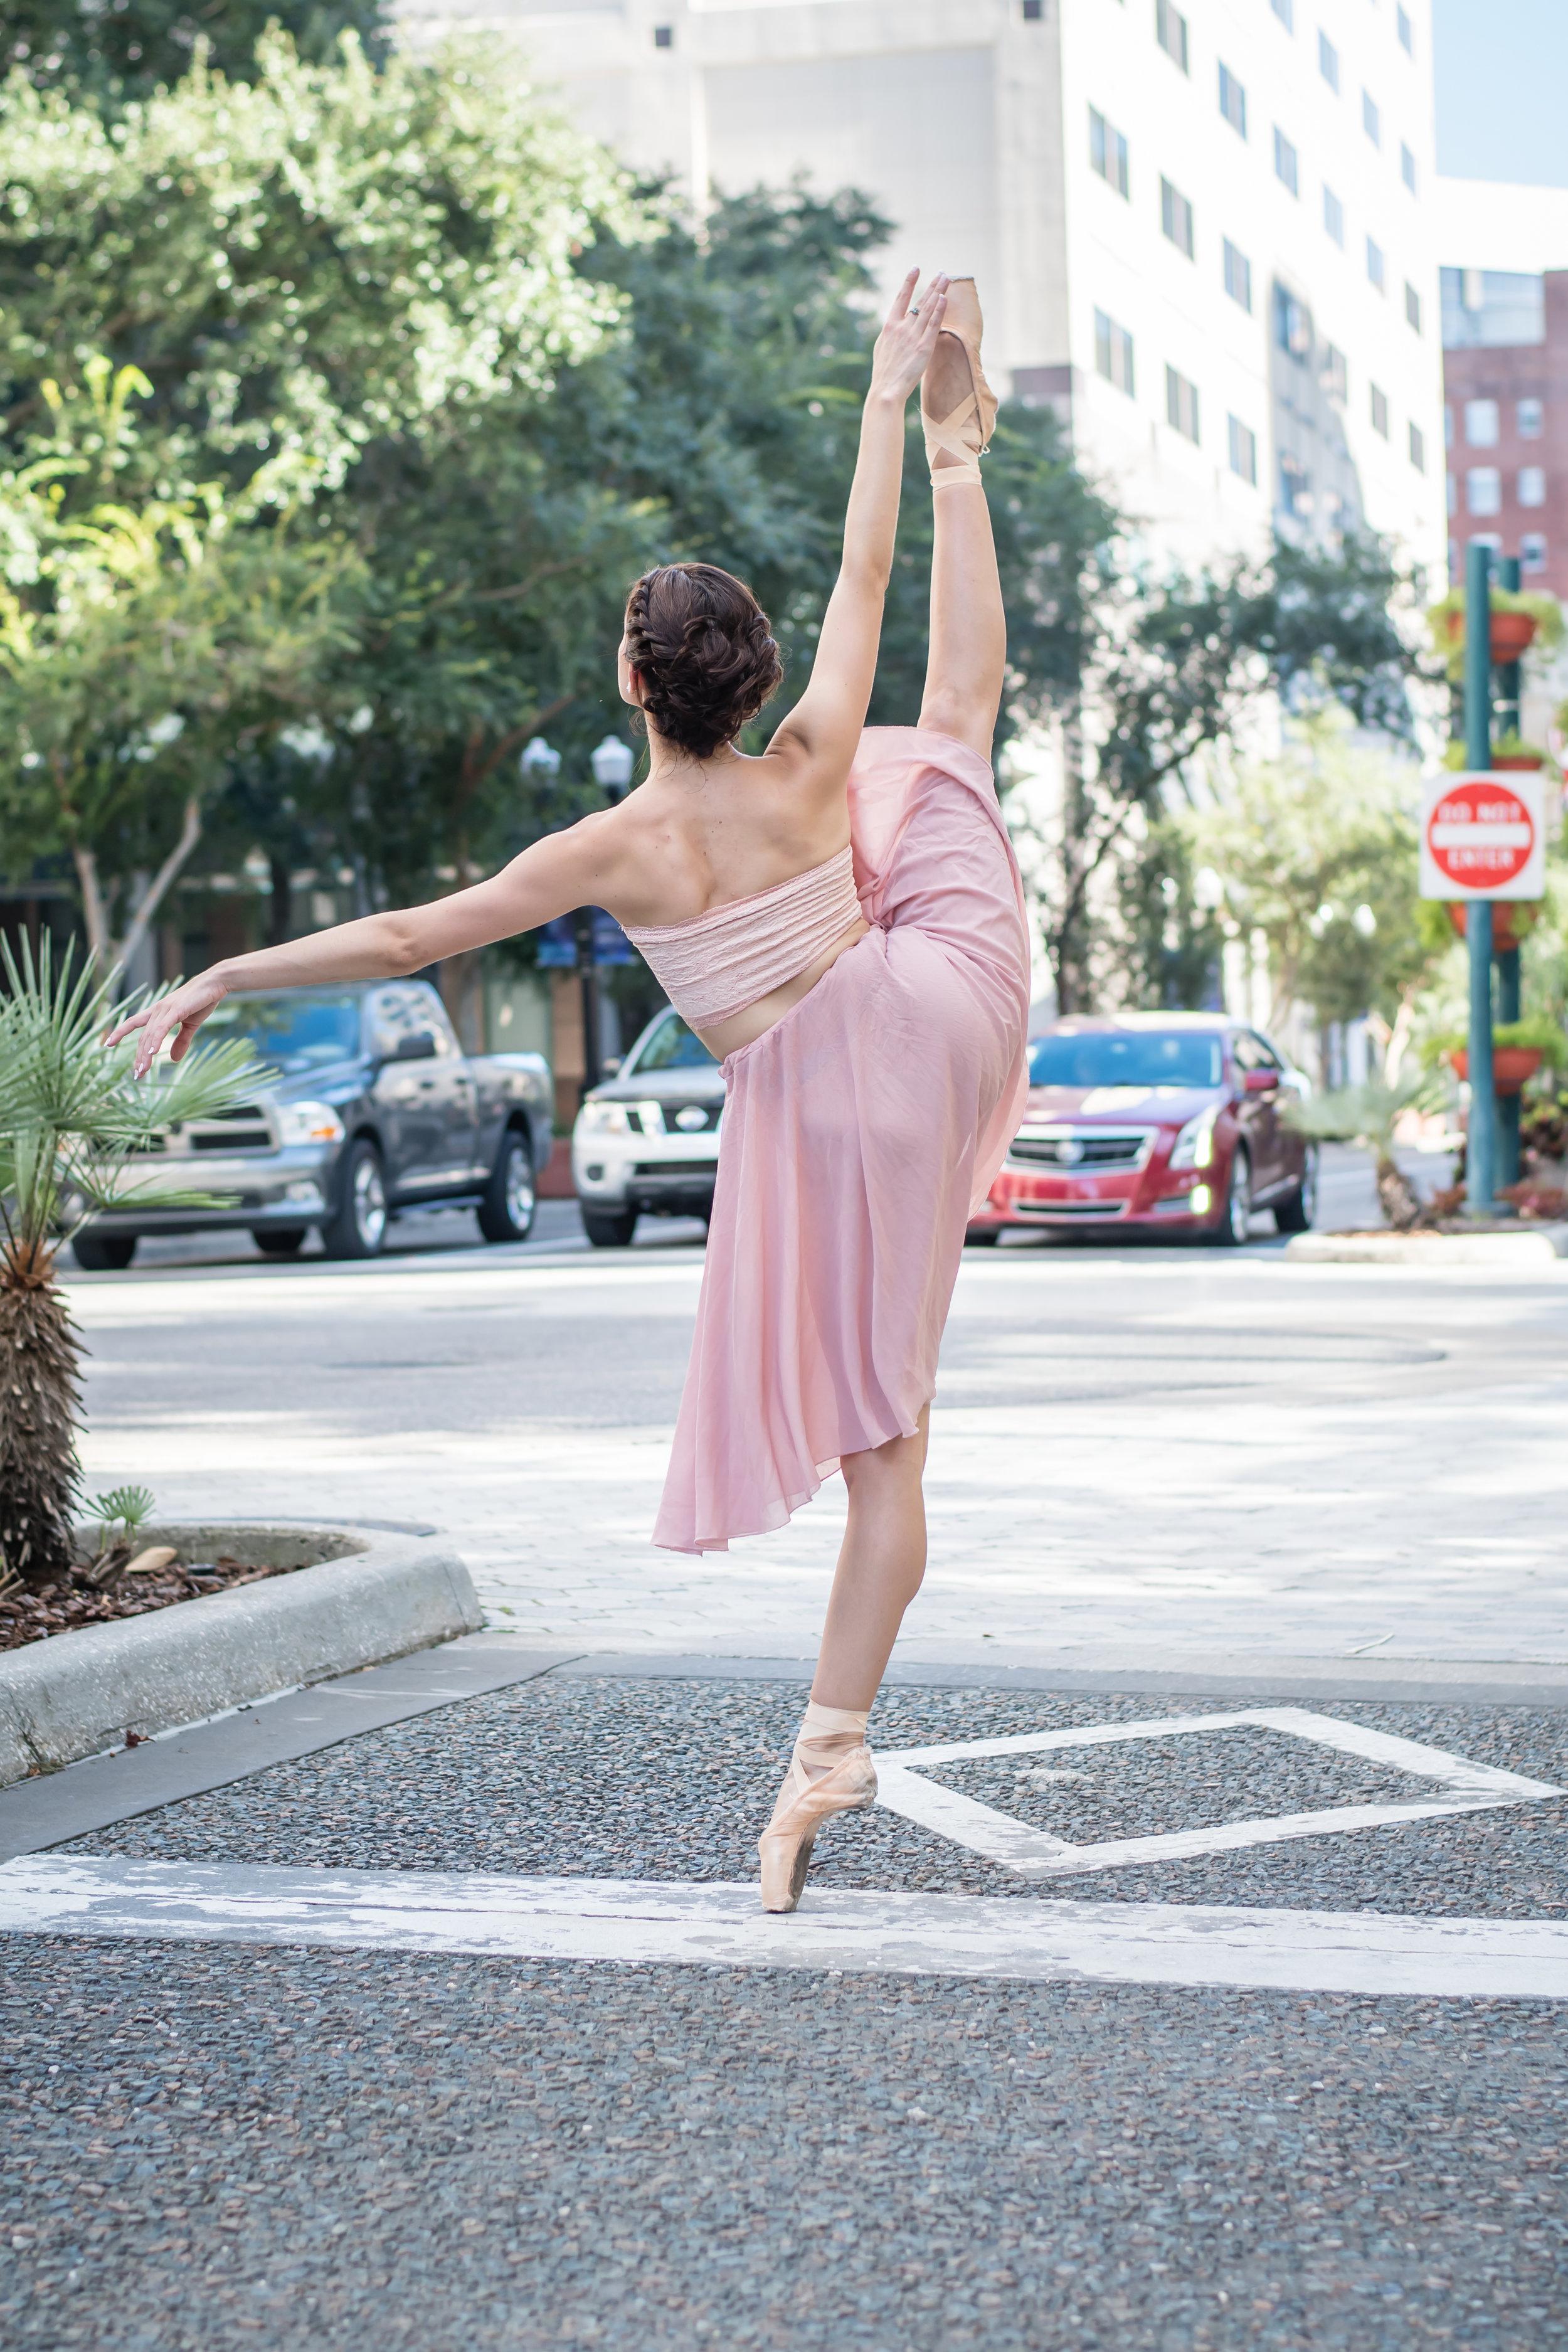 taylor-sambola-orlando-ballet-photography-yanitza-ninett-1.jpg